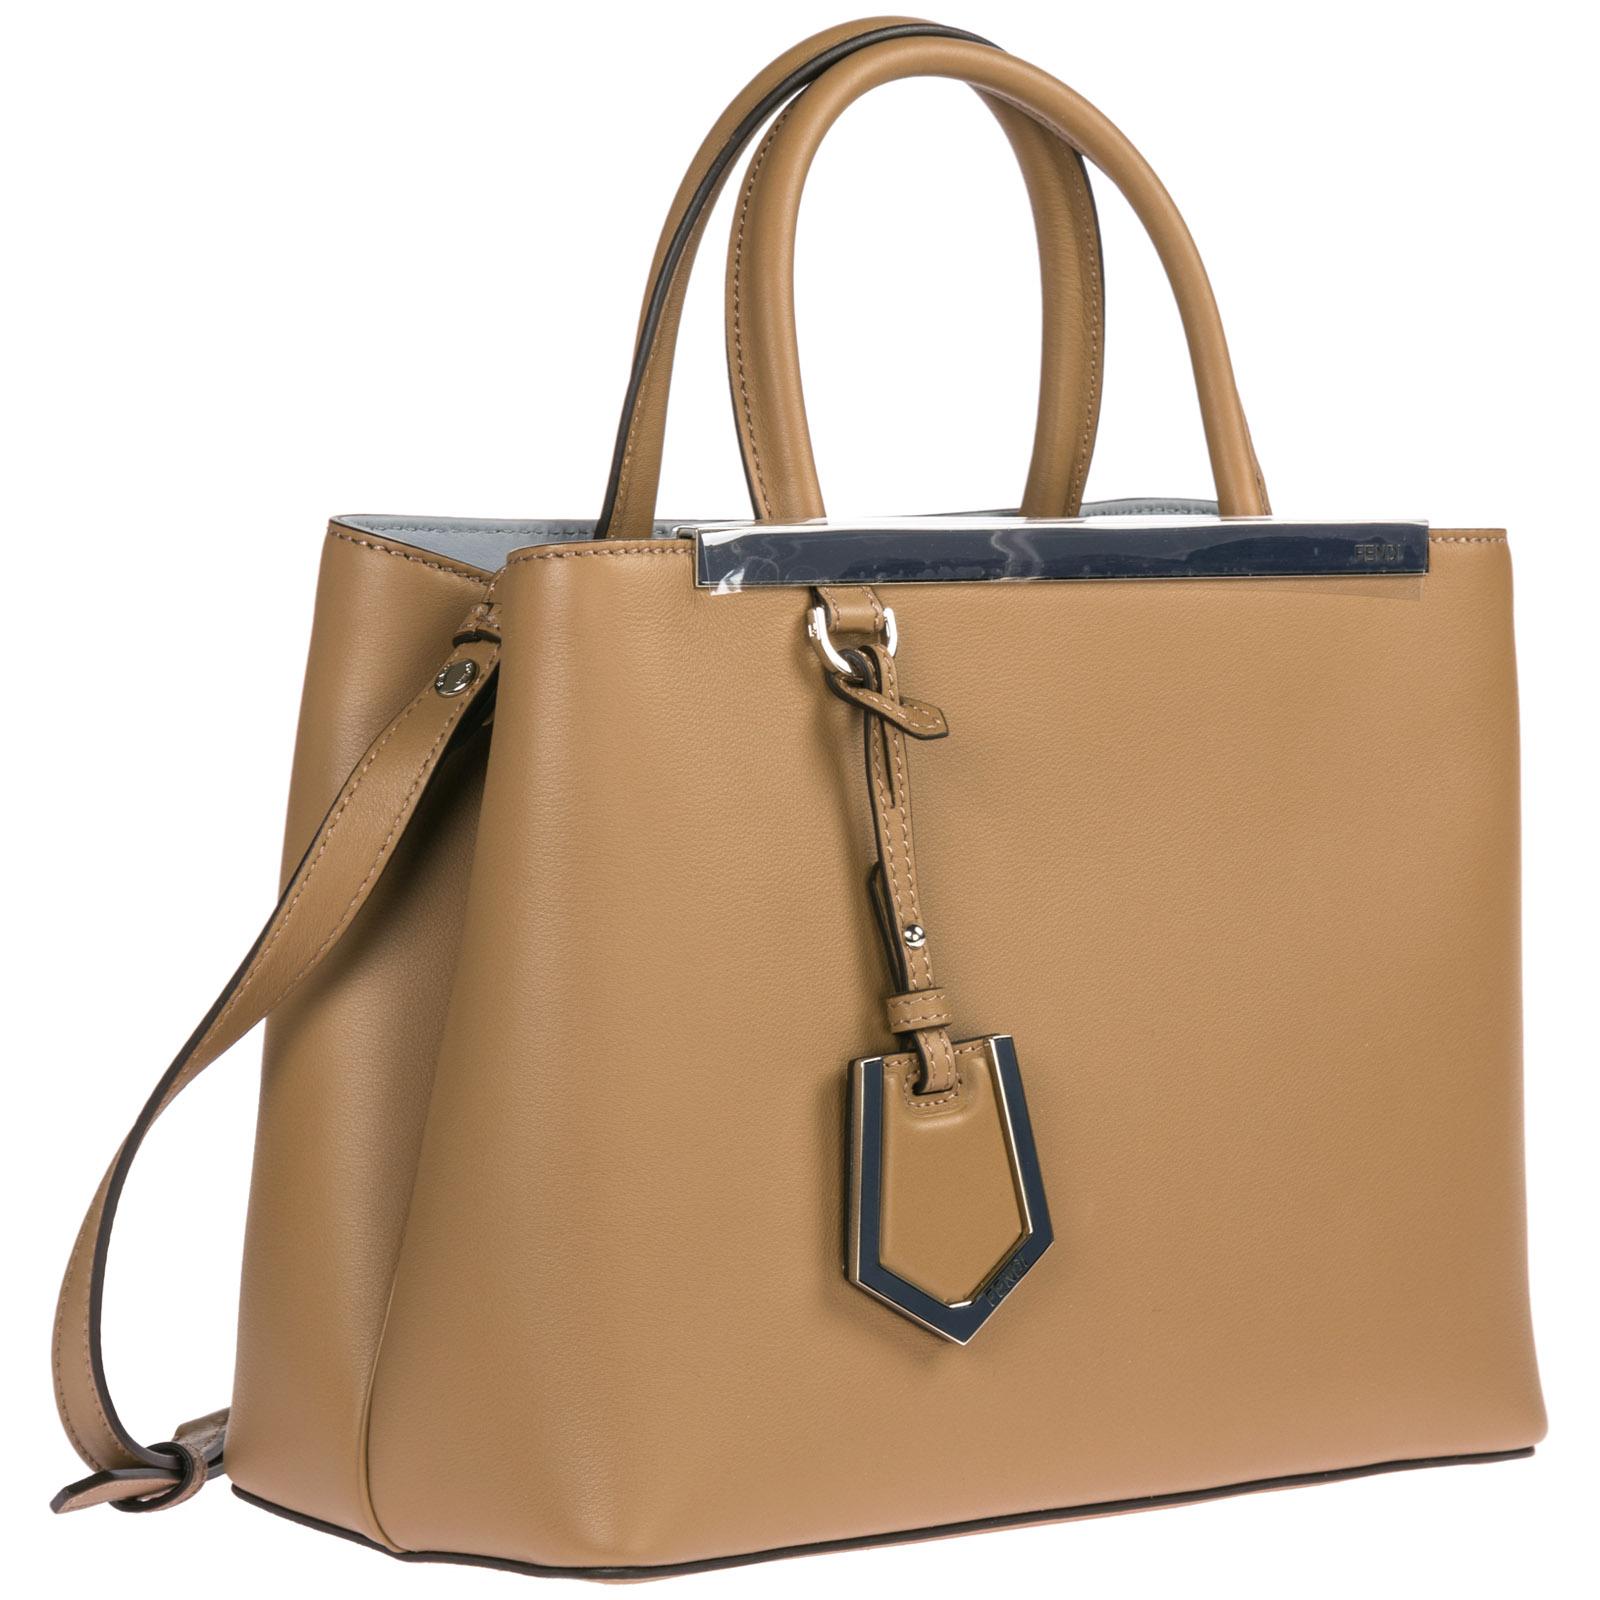 Leder handtasche damen tasche bag petite 2jours